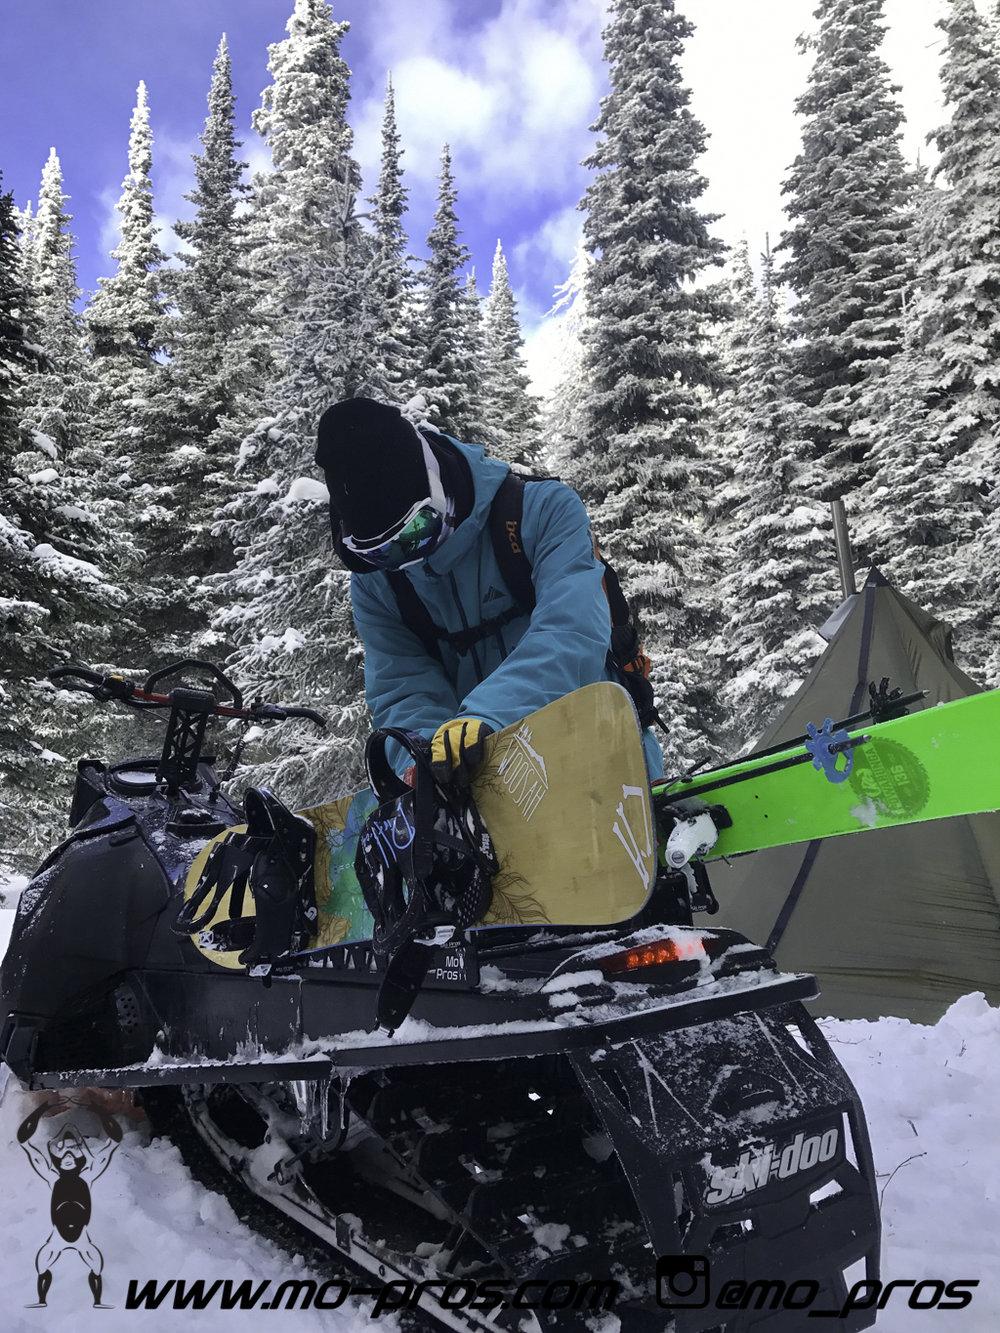 81_Backcountry _Backcountry United_CFR rack_Cheetah Factory Racing_gas Rack_Gear_Gun Rack_LinQ Snowboard Ski_Rack_Ski_Snowbike_snowboard_Snowboard rack_Snowboarding_Snowmobile_snowmobile bag_timbersl.jpg